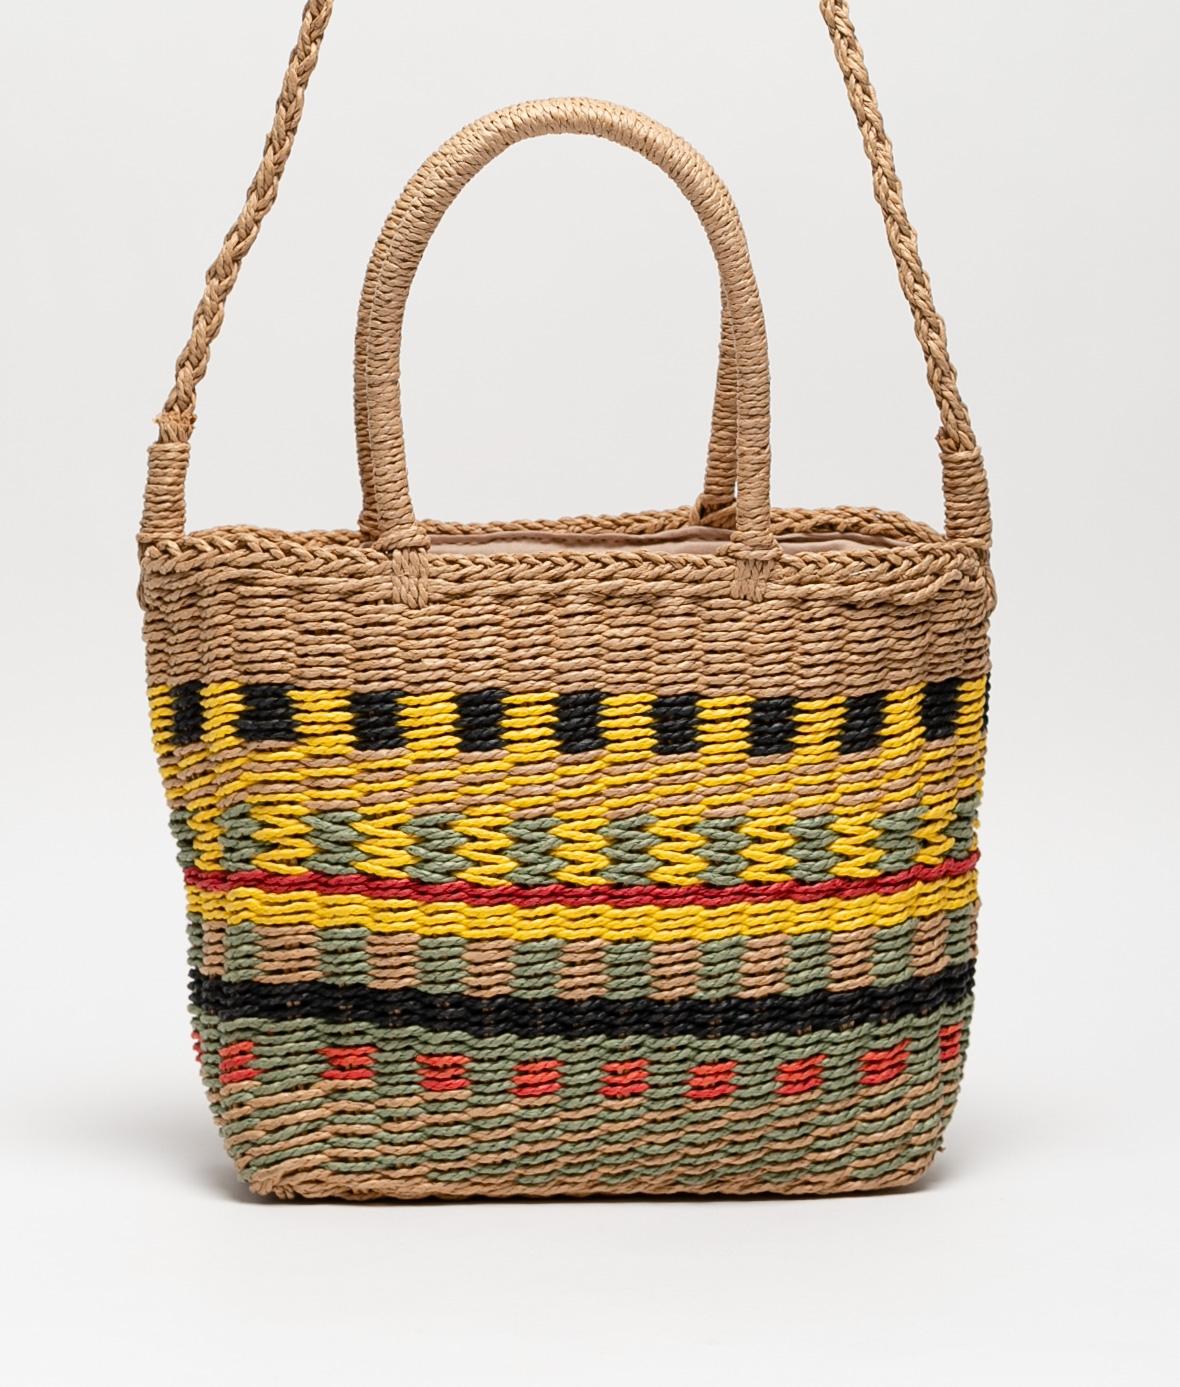 Bag Cies - Cinnamon